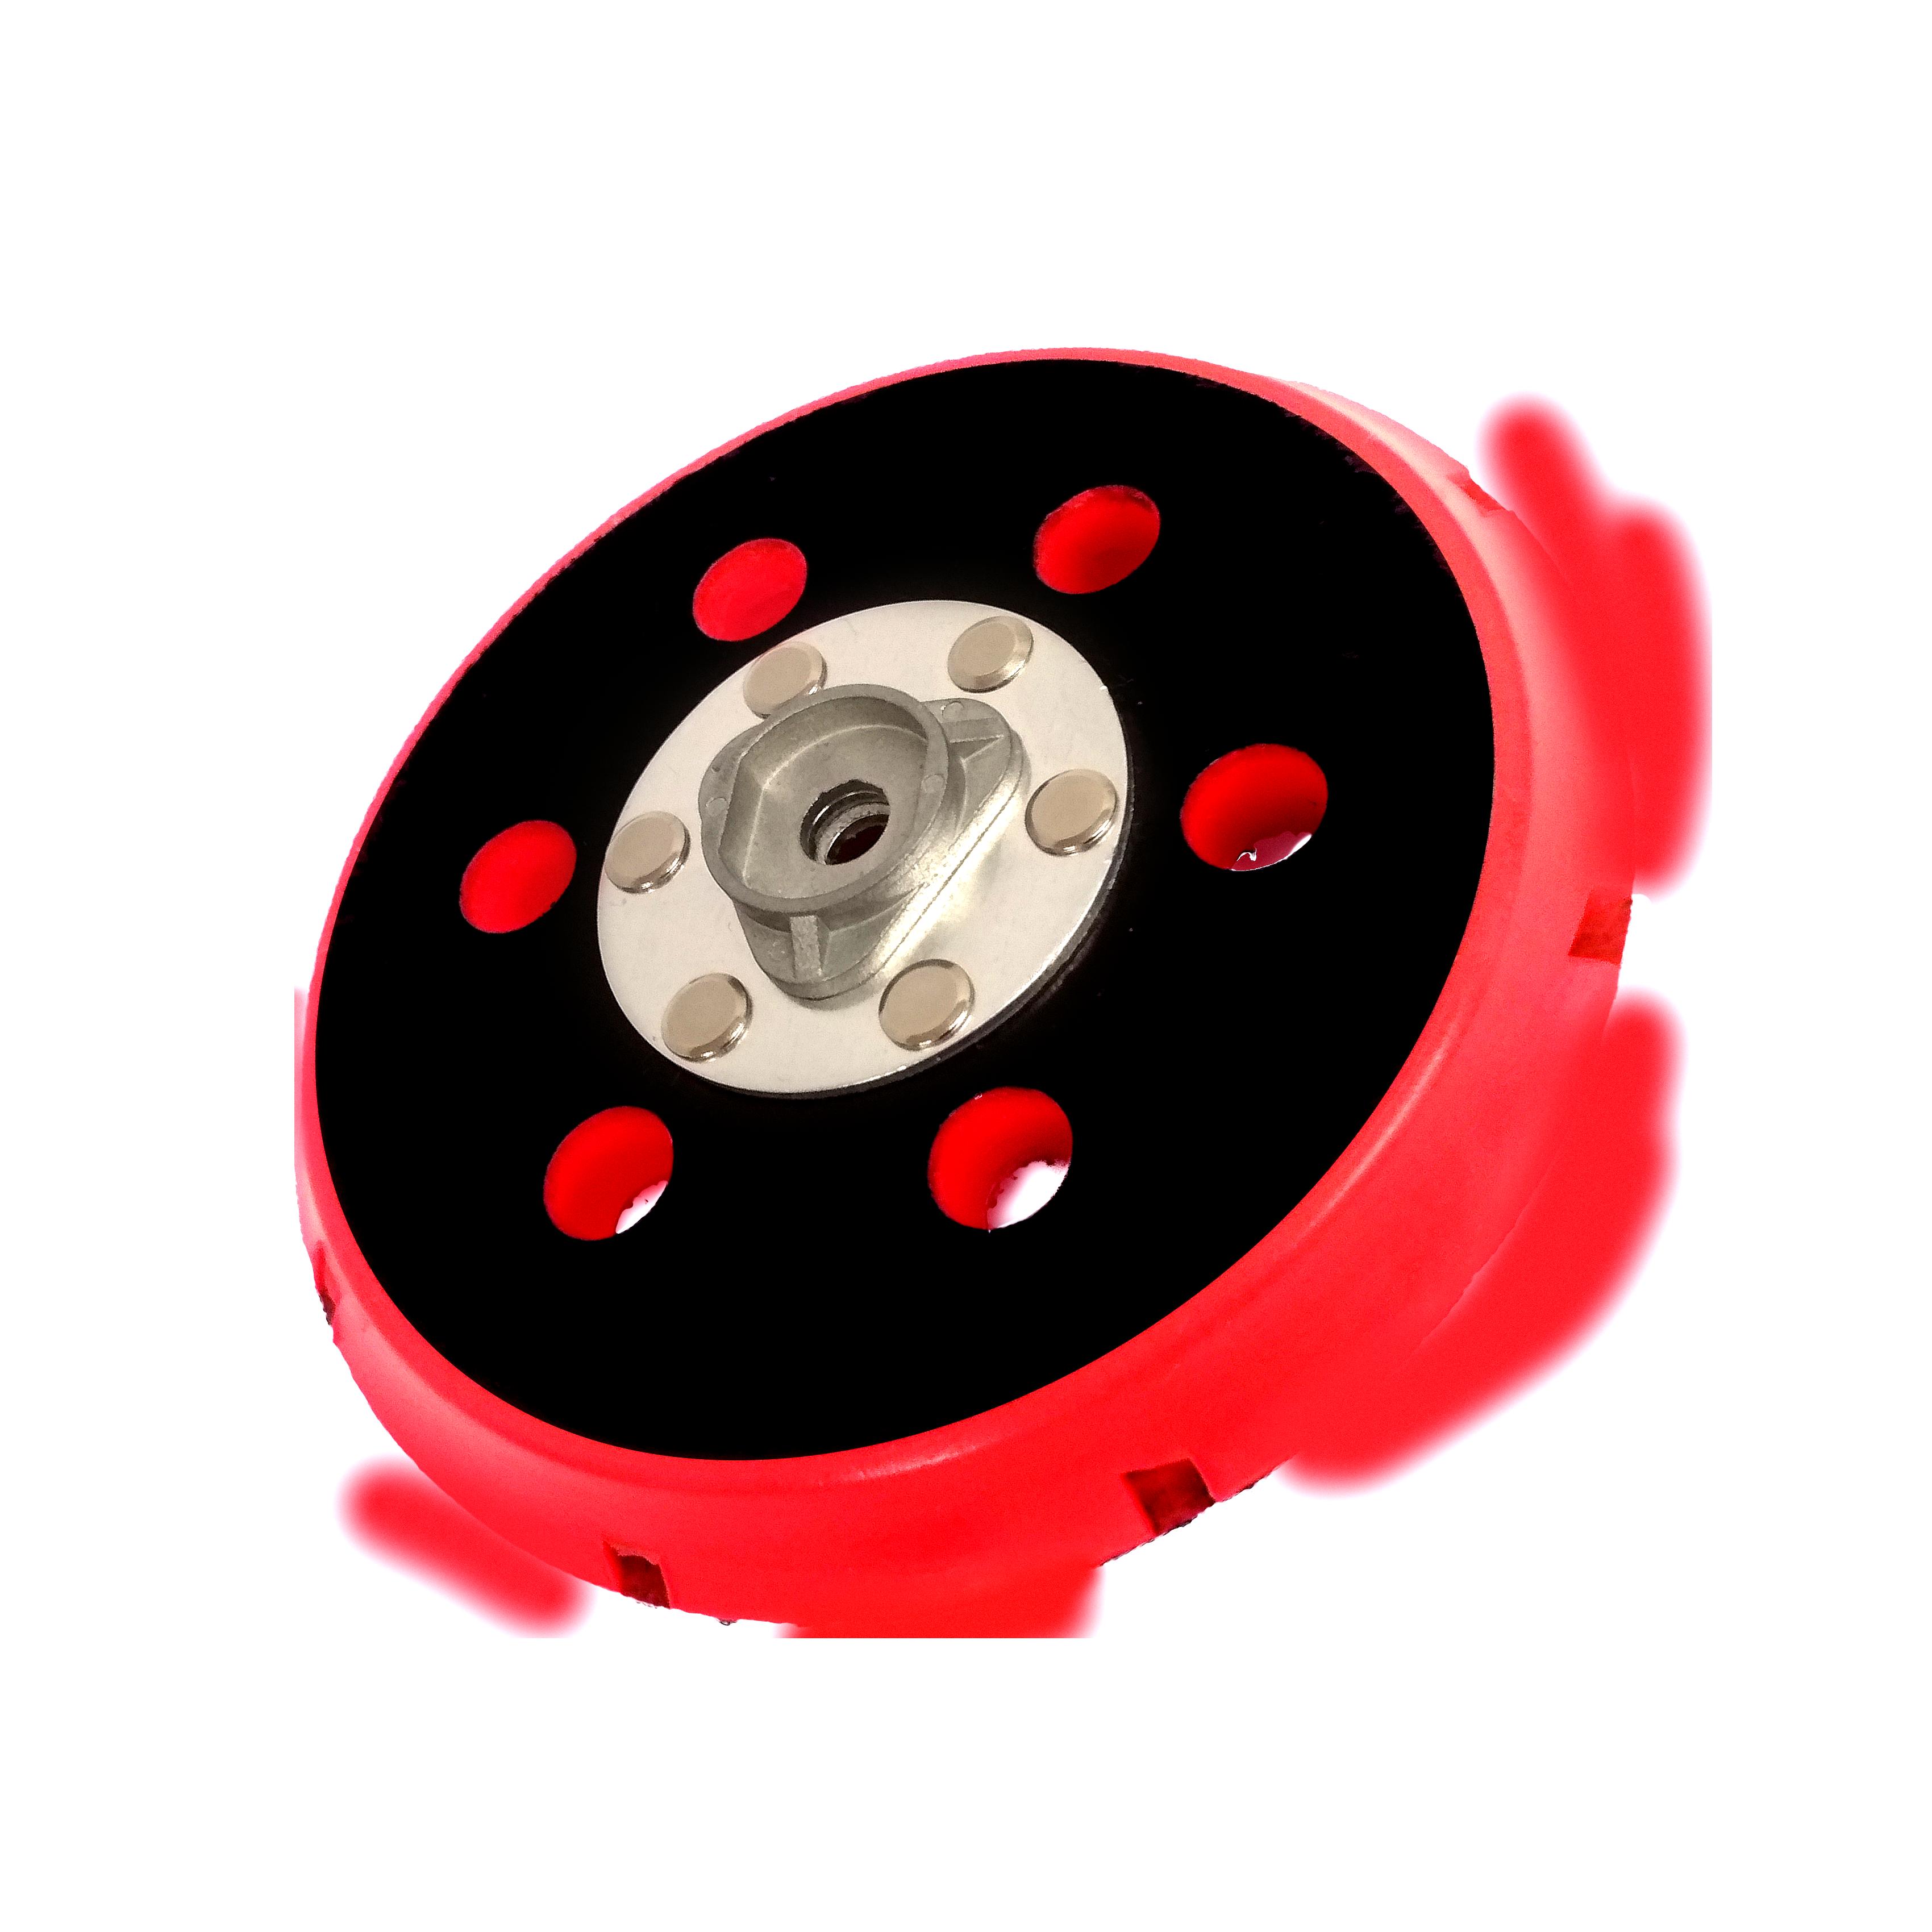 ADBL ROLLER D15125-01 125mm BACKING PLATE